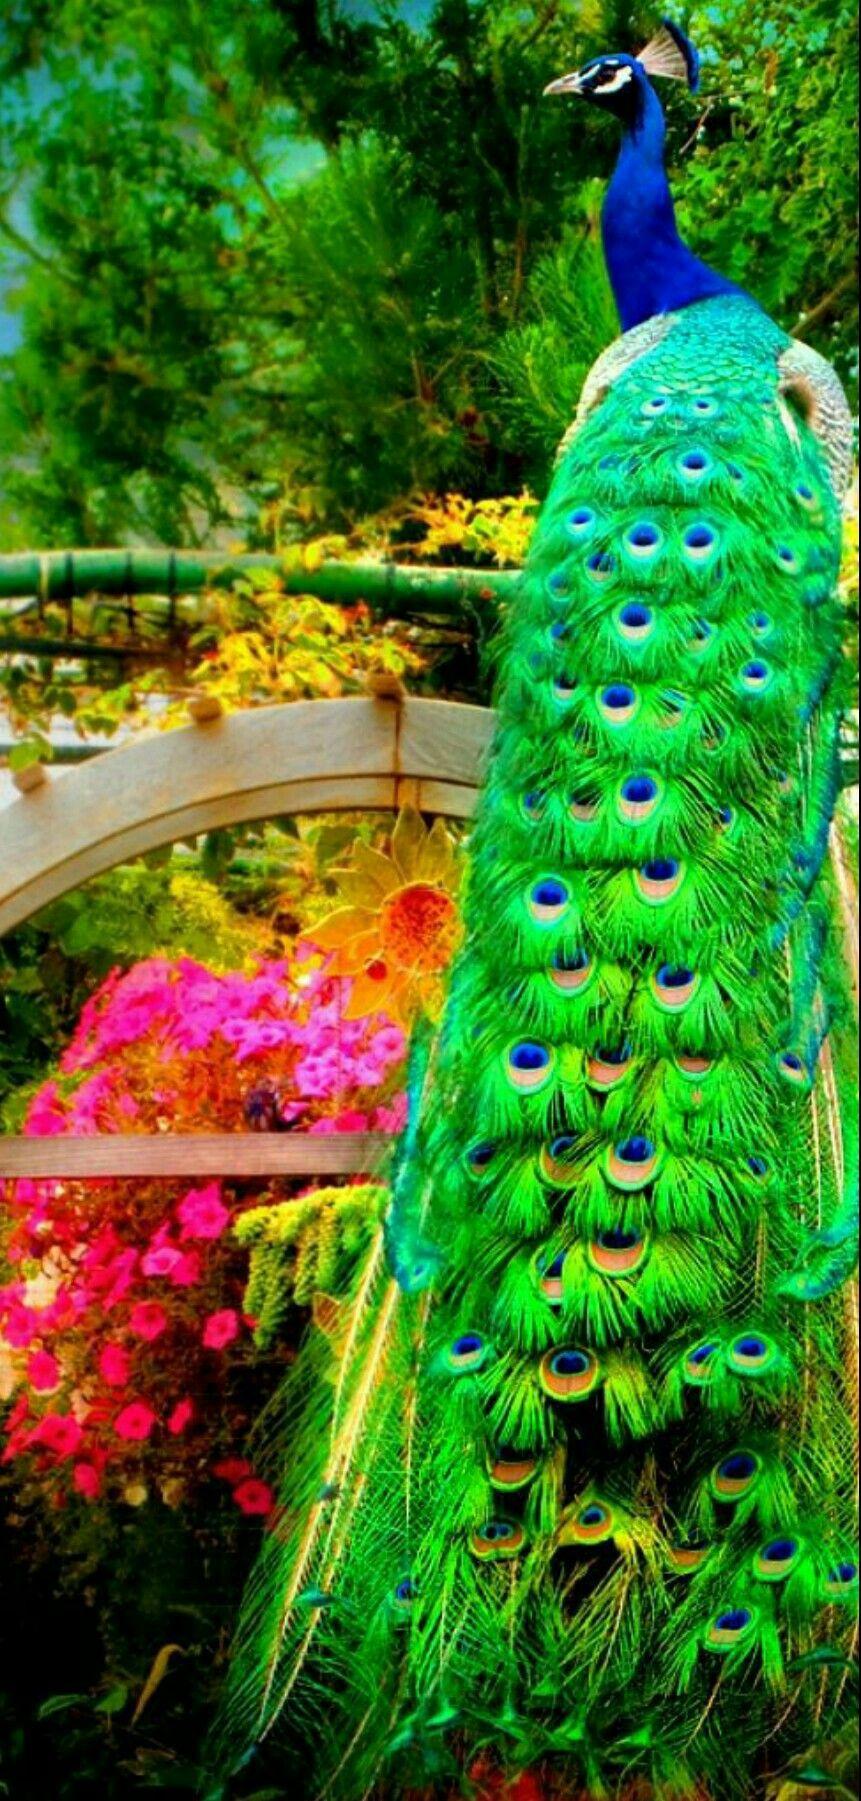 Beautiful bird and amazing colors birdhouses birds butterflies peacock animals beautiful - Beautiful peacock feather ...